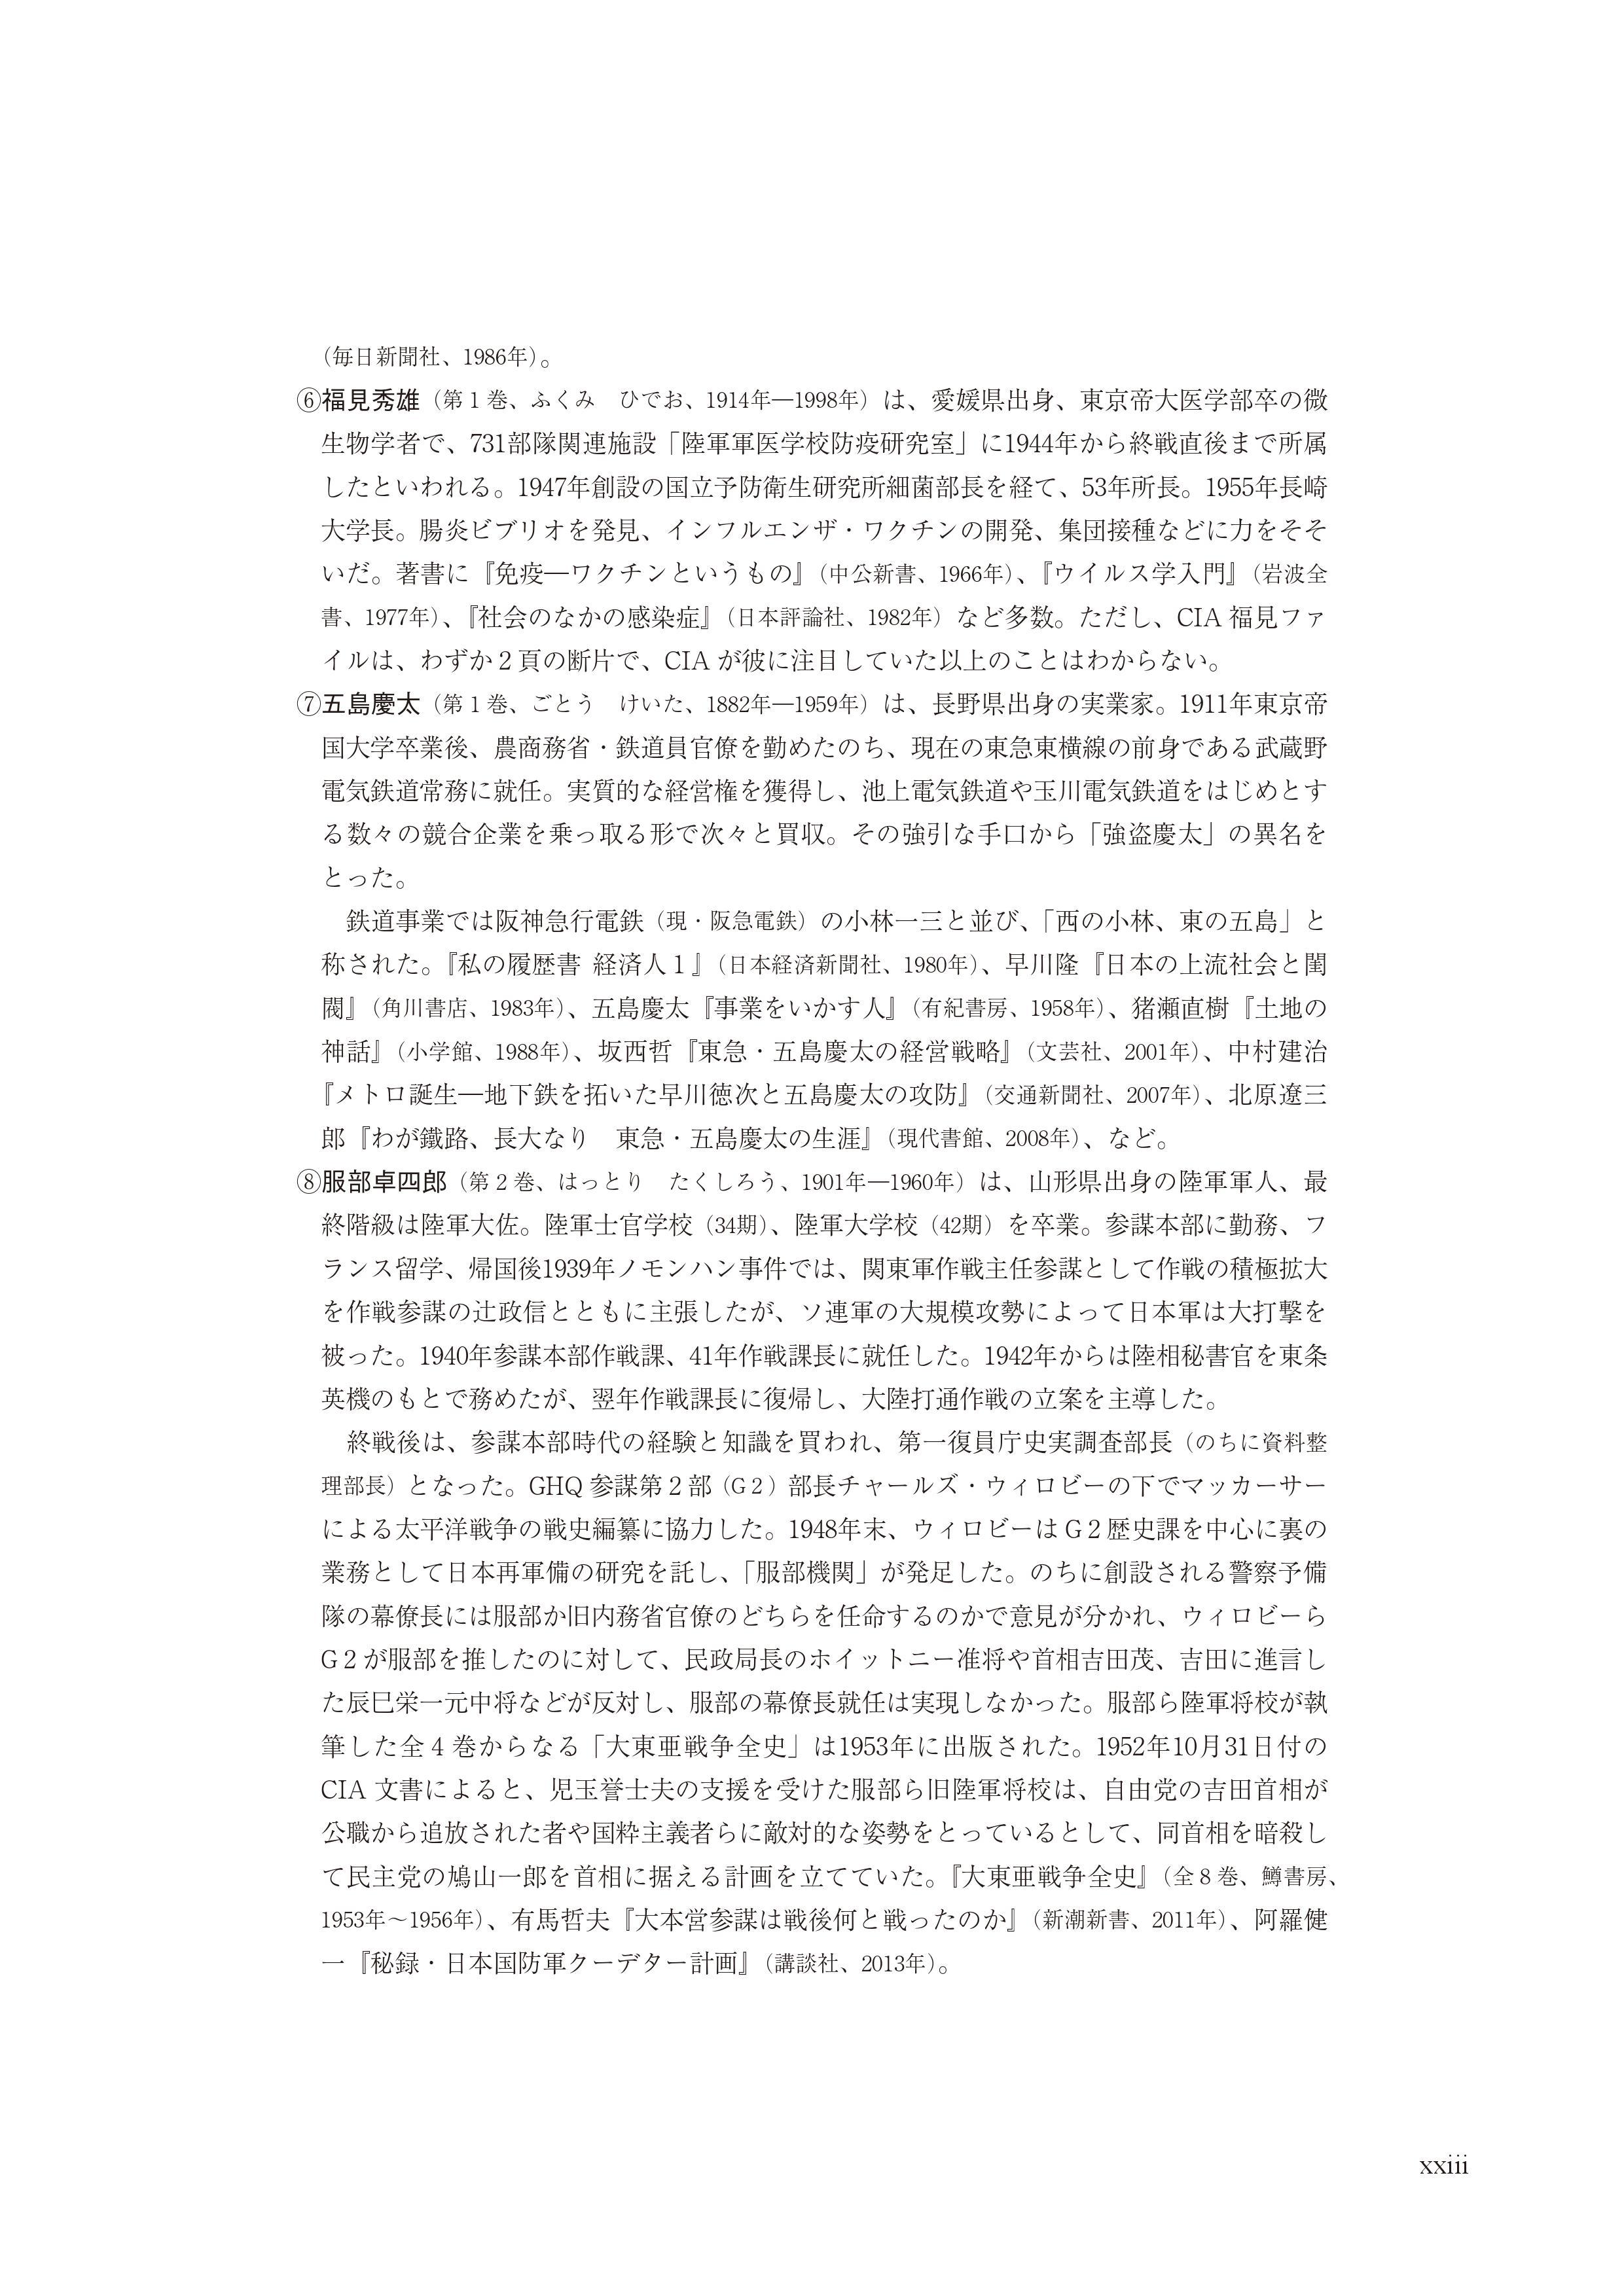 CIA日本人ファイル0001 (23)